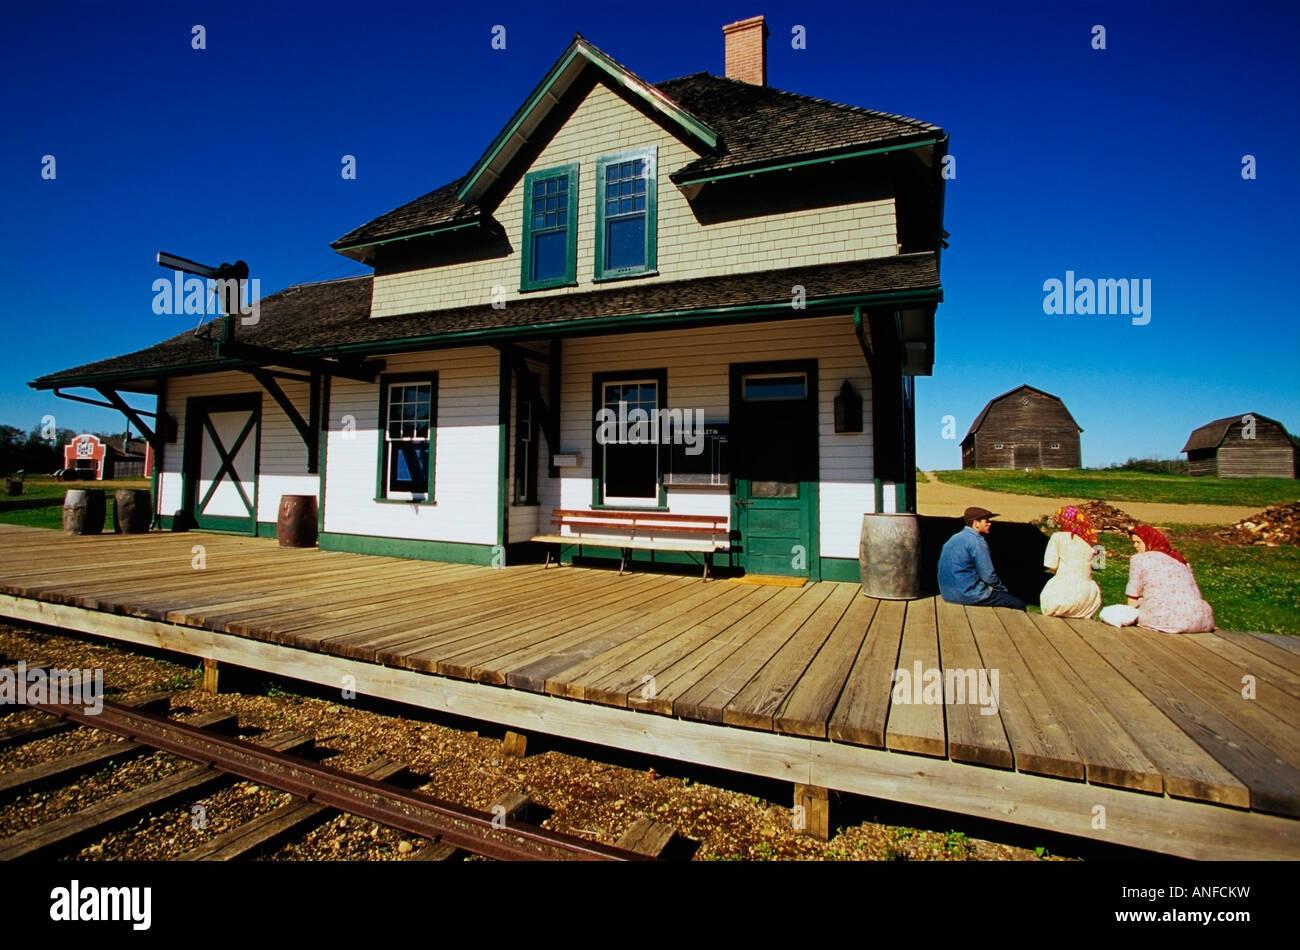 Children at Train station, Ukrainian Cultural Heritage Village, Edmonton, Alberta, Canada. - Stock Image